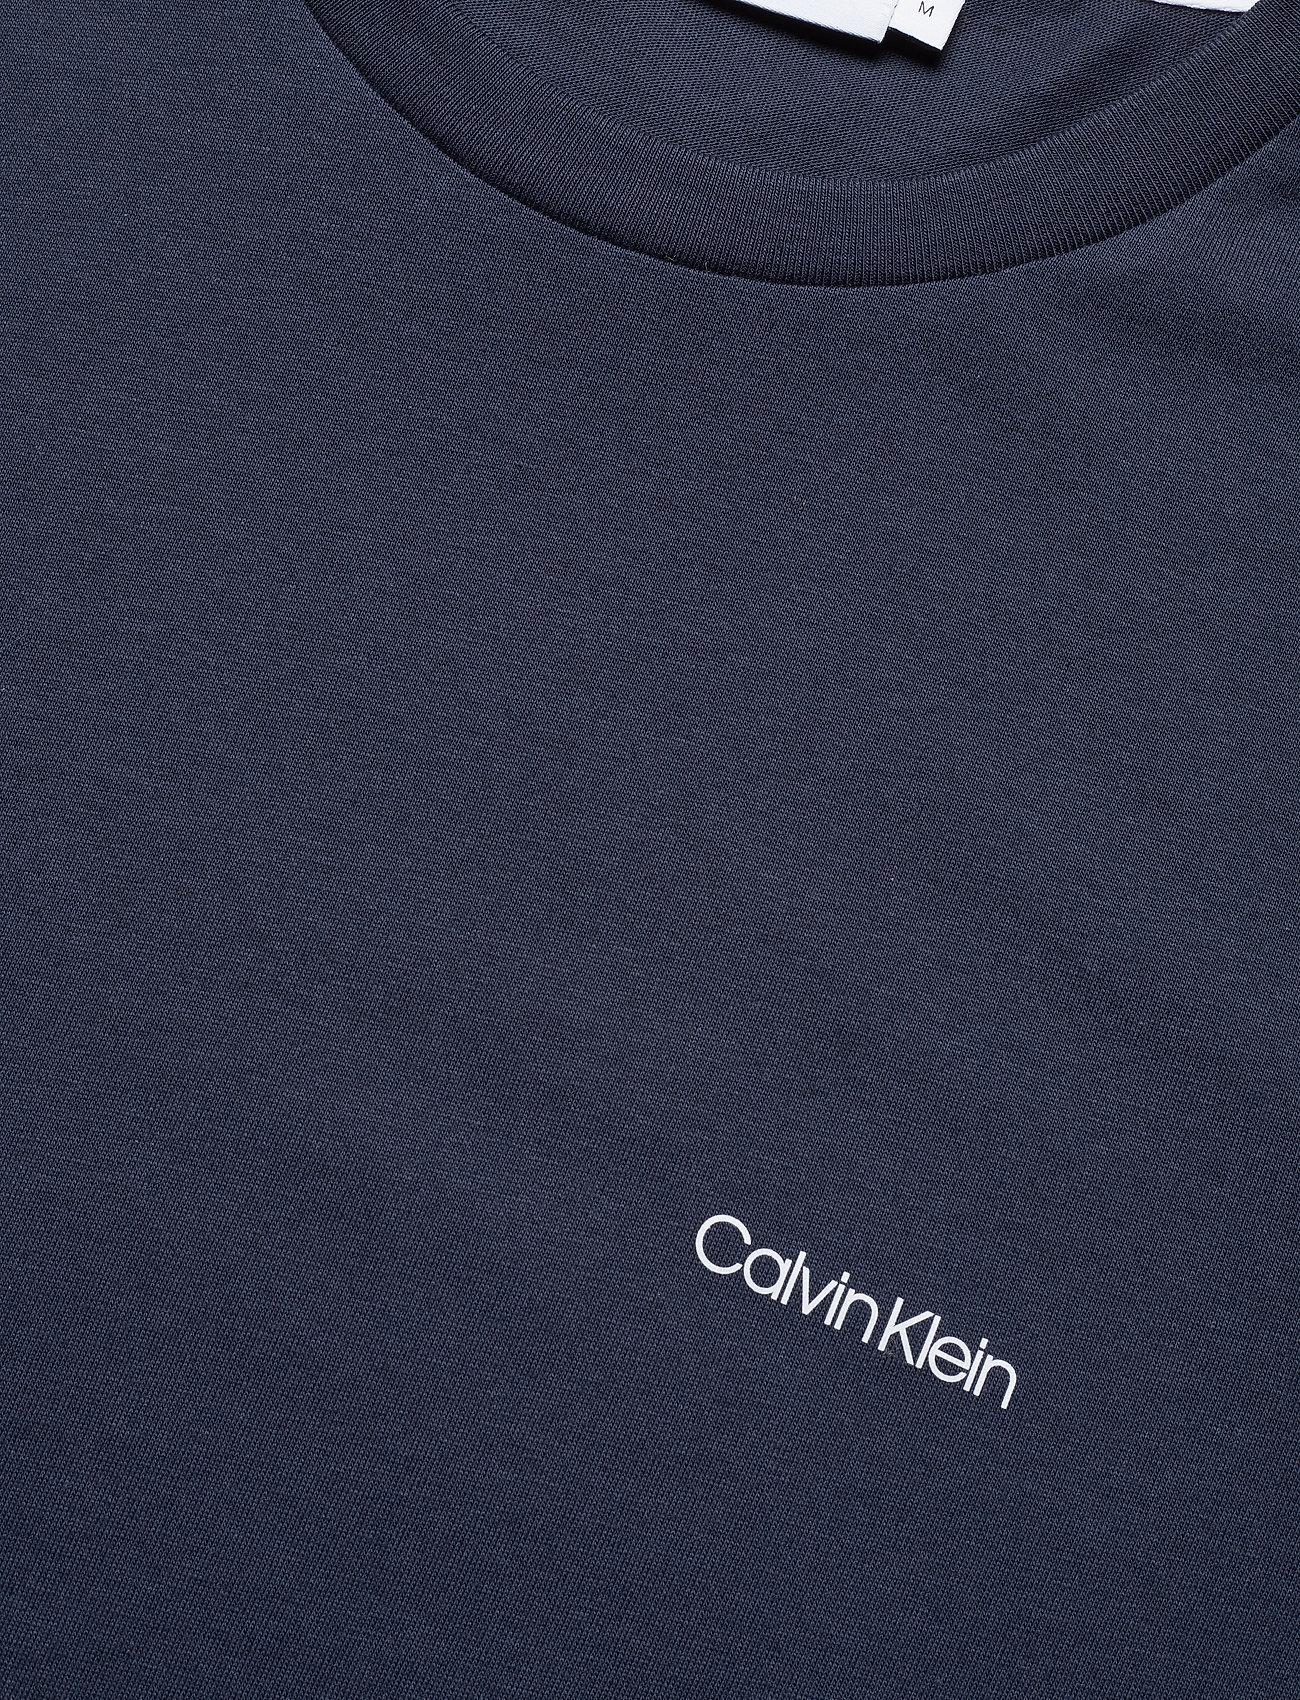 Calvin Klein - COTTON CHEST LOGO T-SHIRT - basic t-shirts - calvin navy - 2